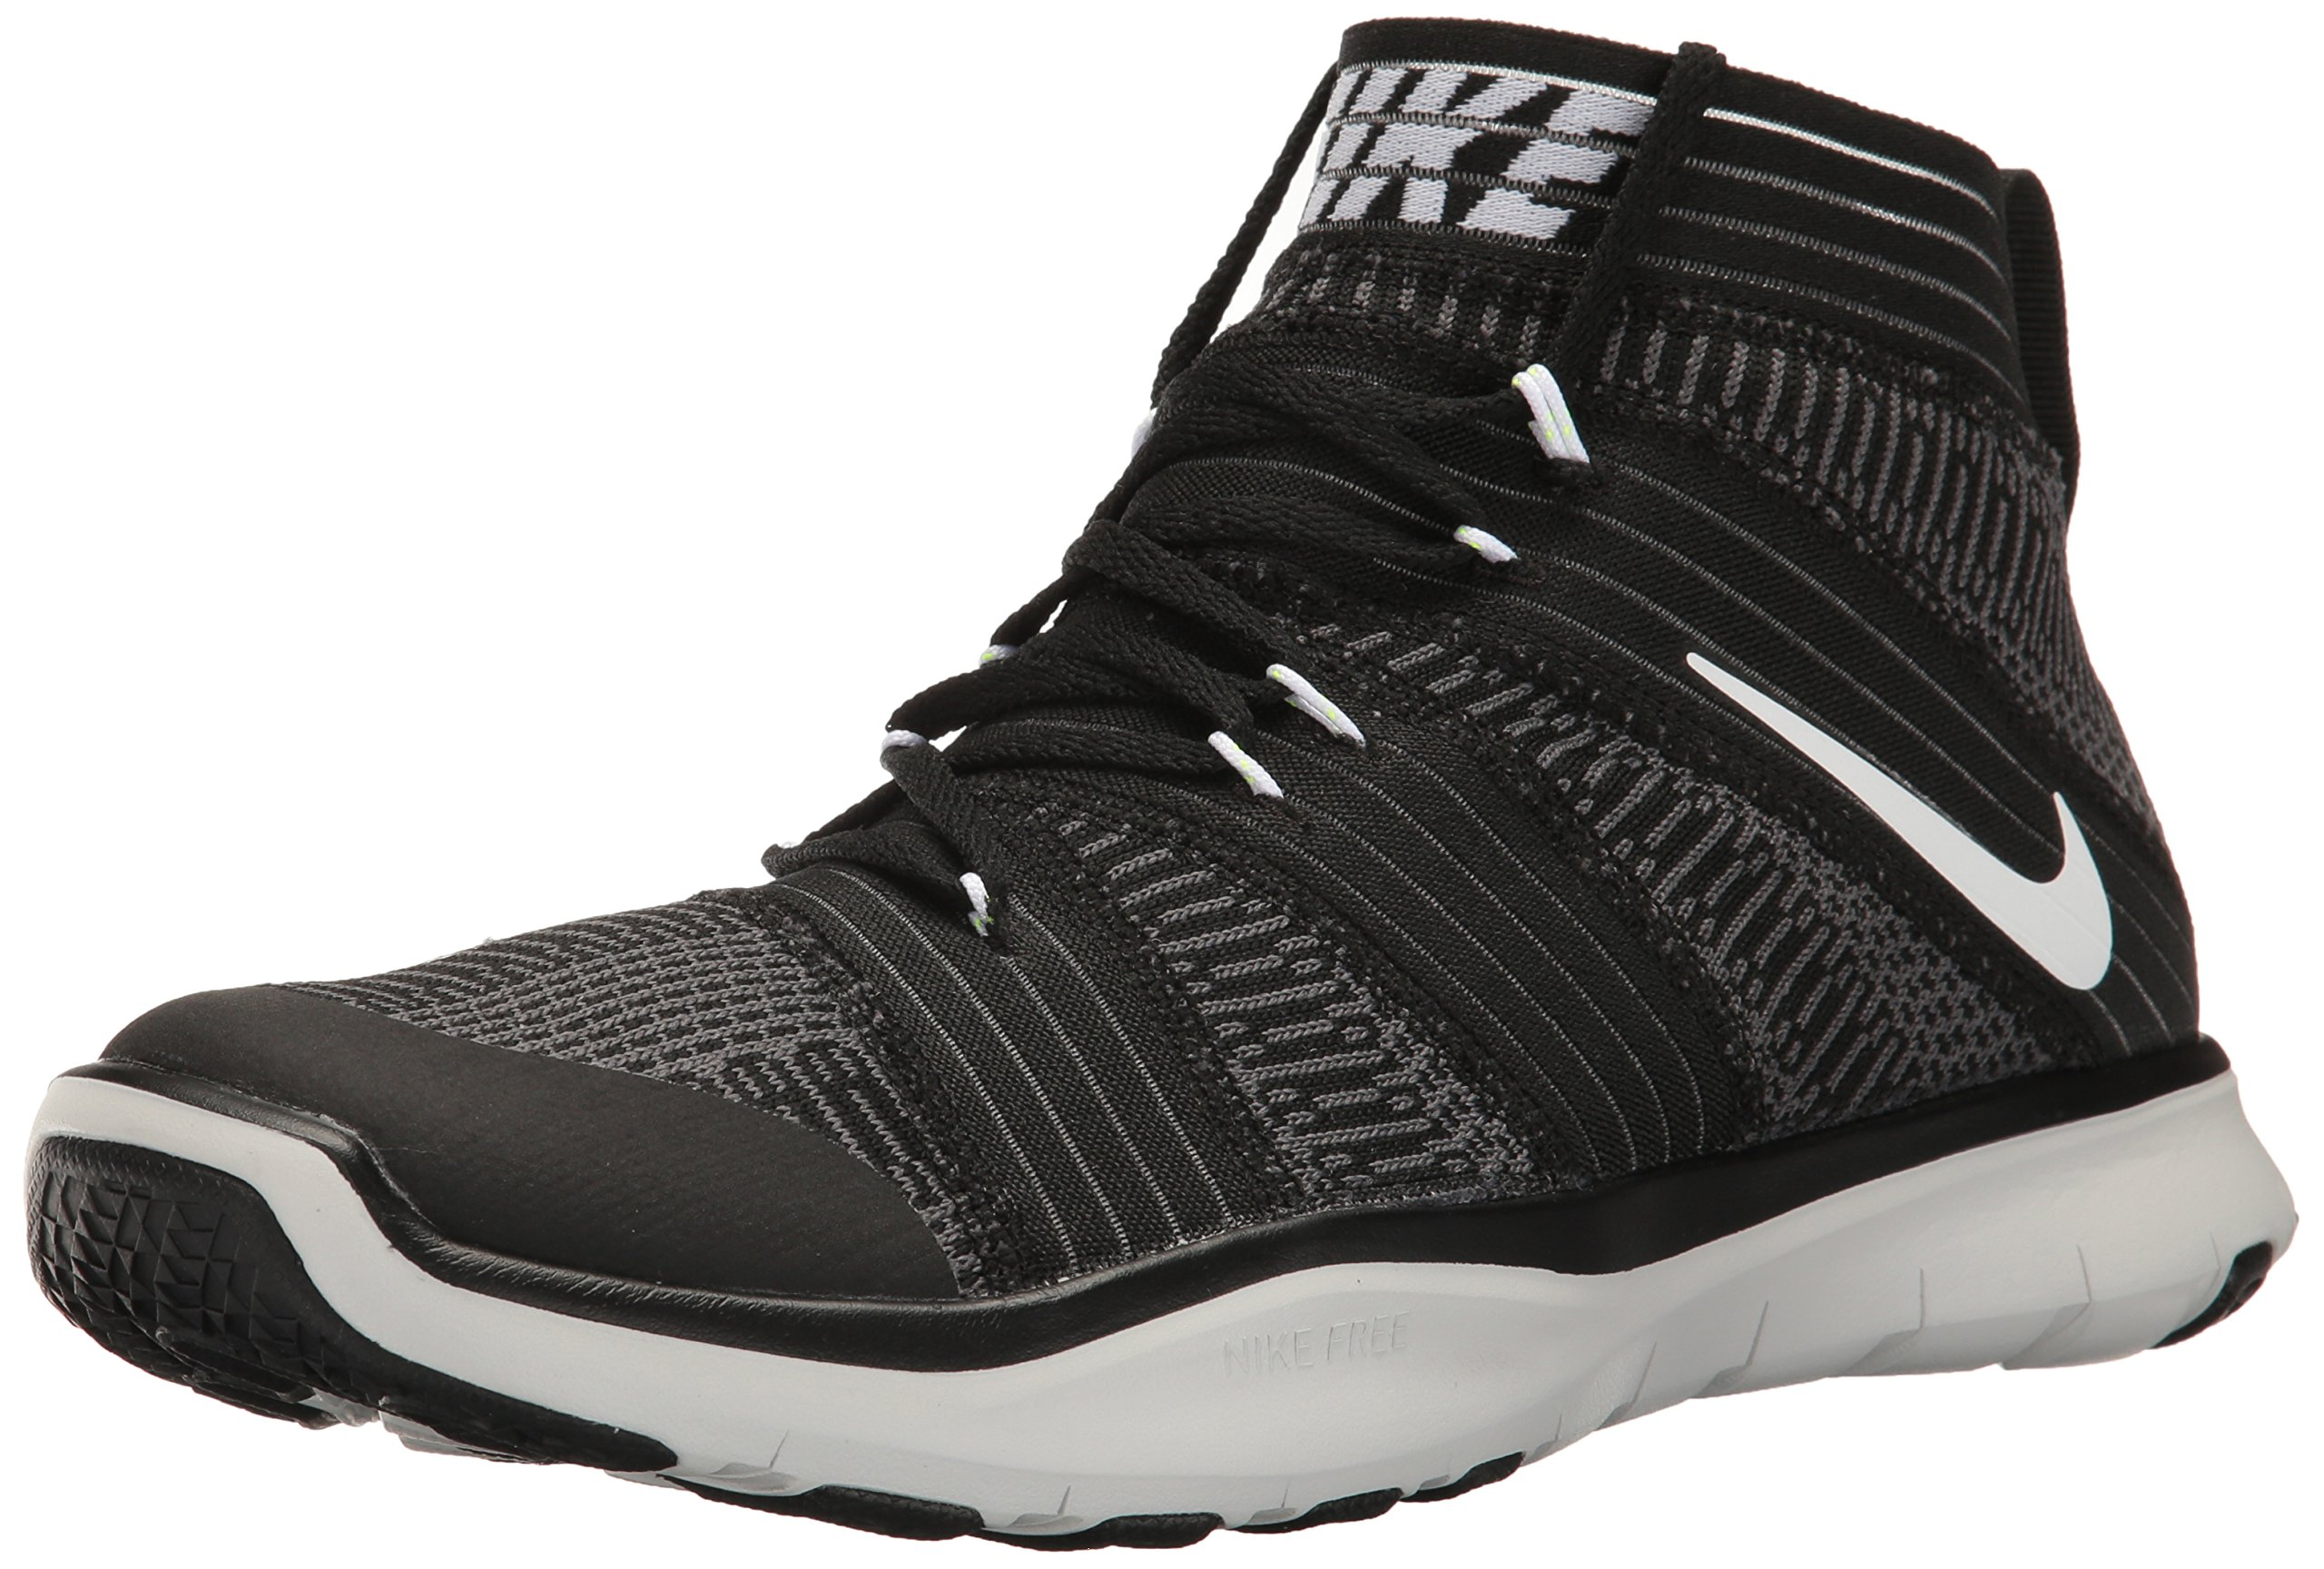 Nike Mens Free Train Virtue Training Shoes Black/White/Dark Grey 898052-001 Size 8